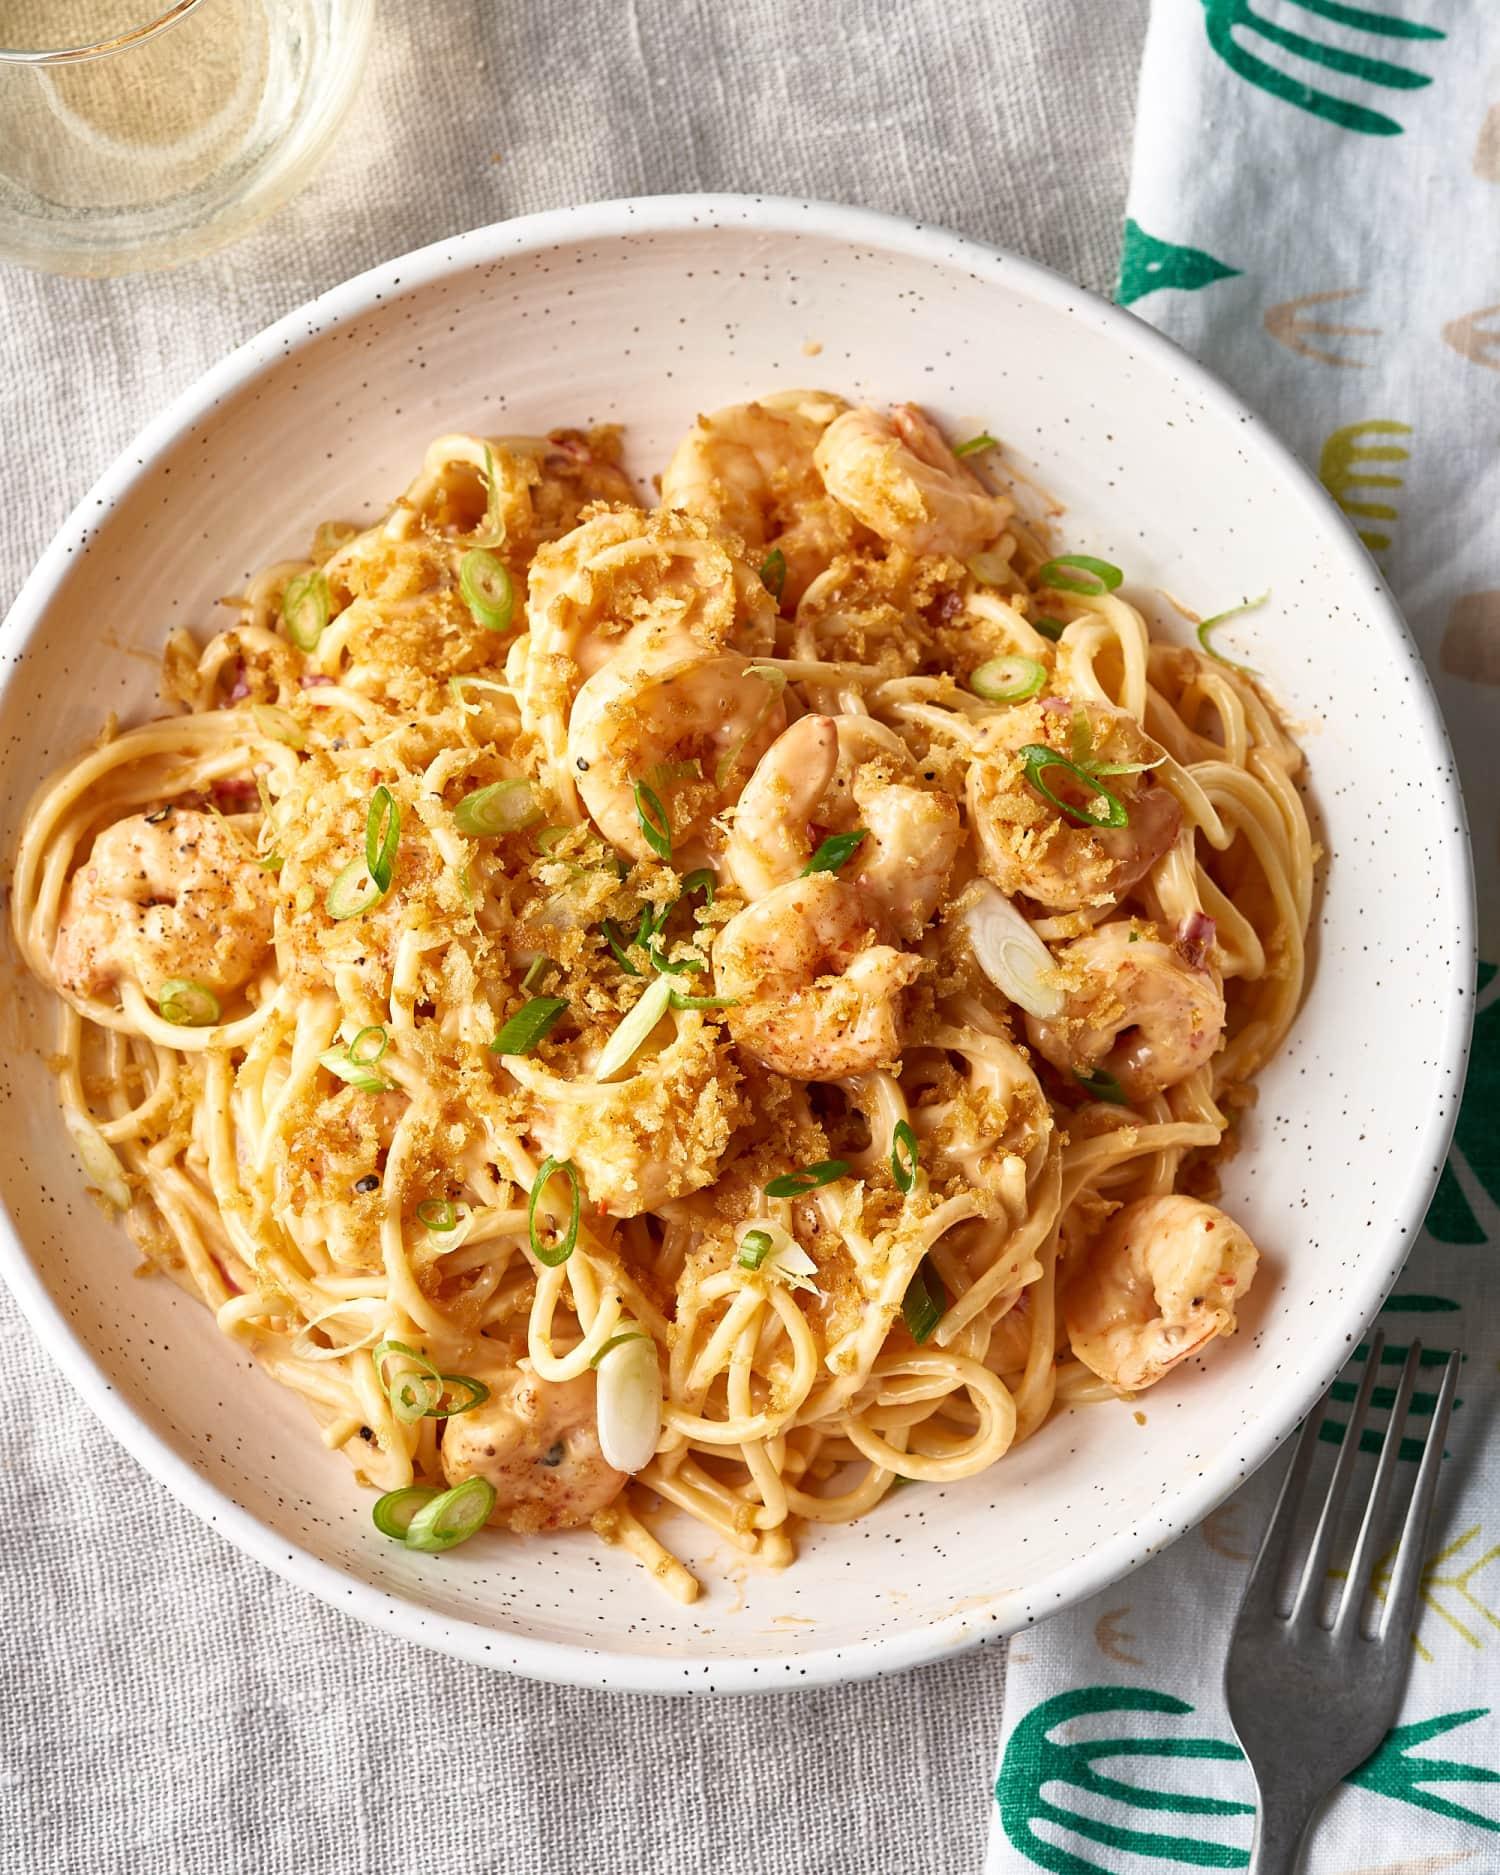 This Shrimp Pasta with Creamy Mozzarella Sauce Is Dreamy